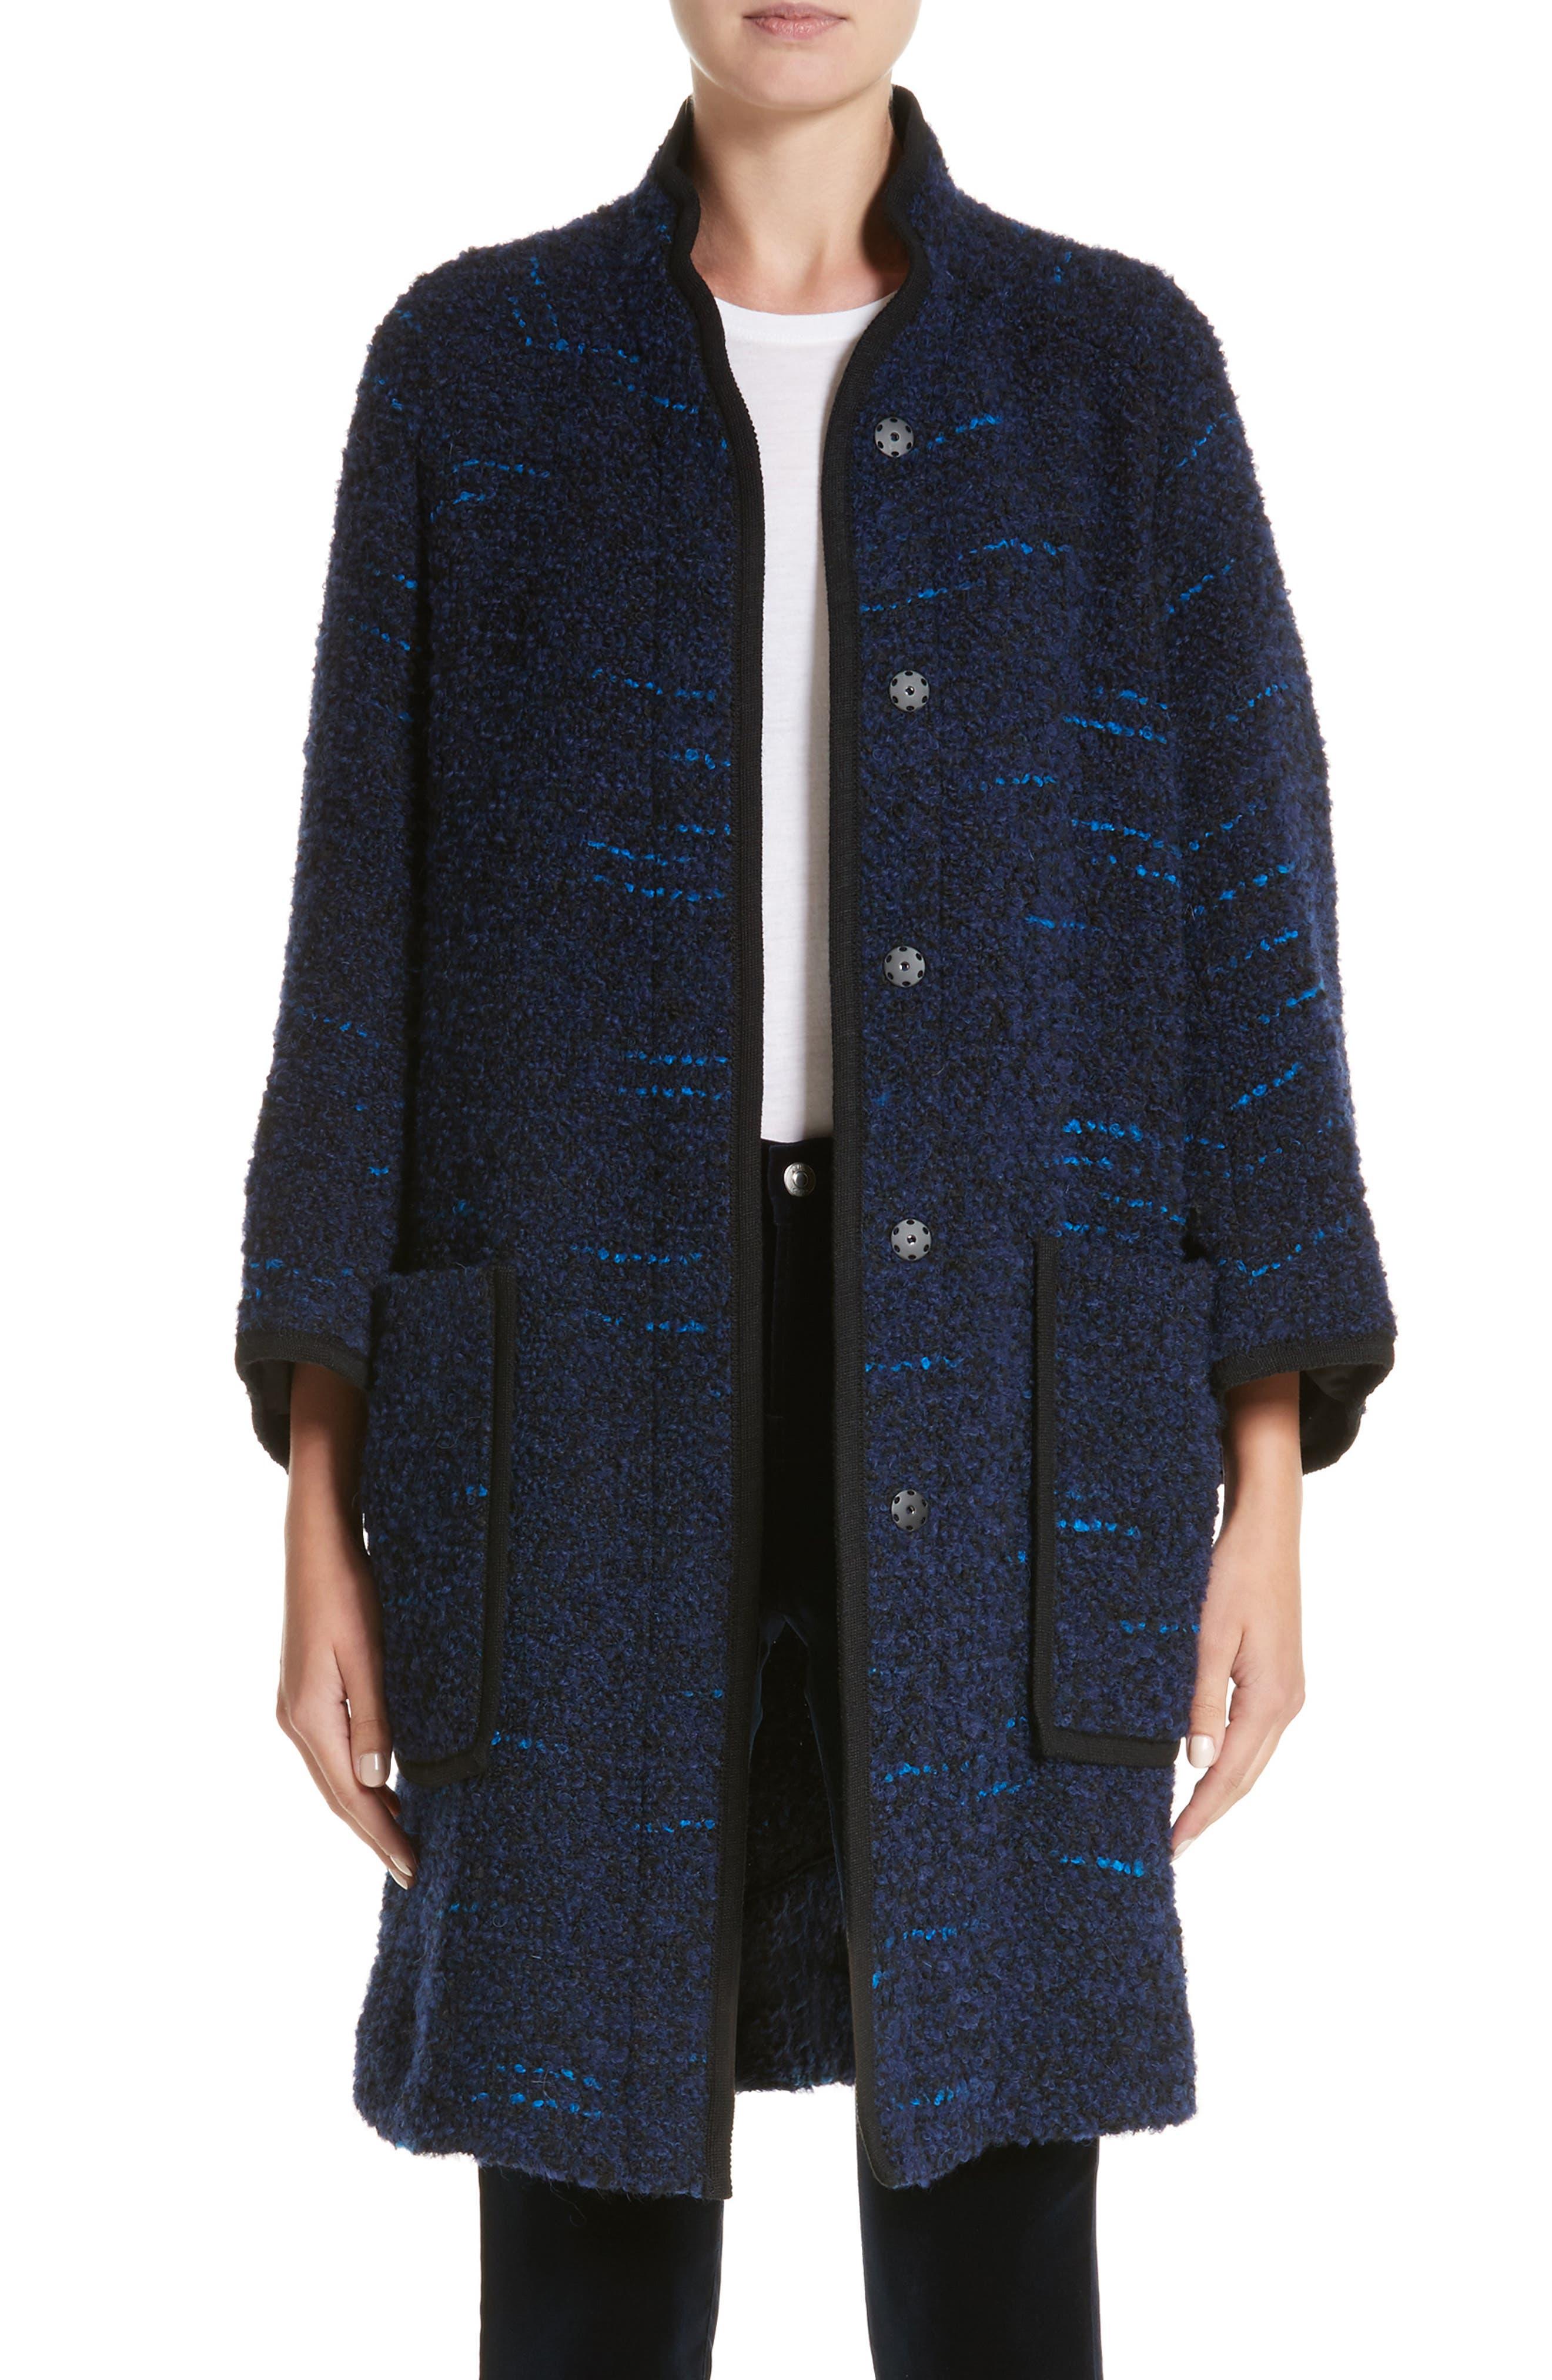 Wool Blend Swing Coat,                         Main,                         color, Navy / Blue Multi